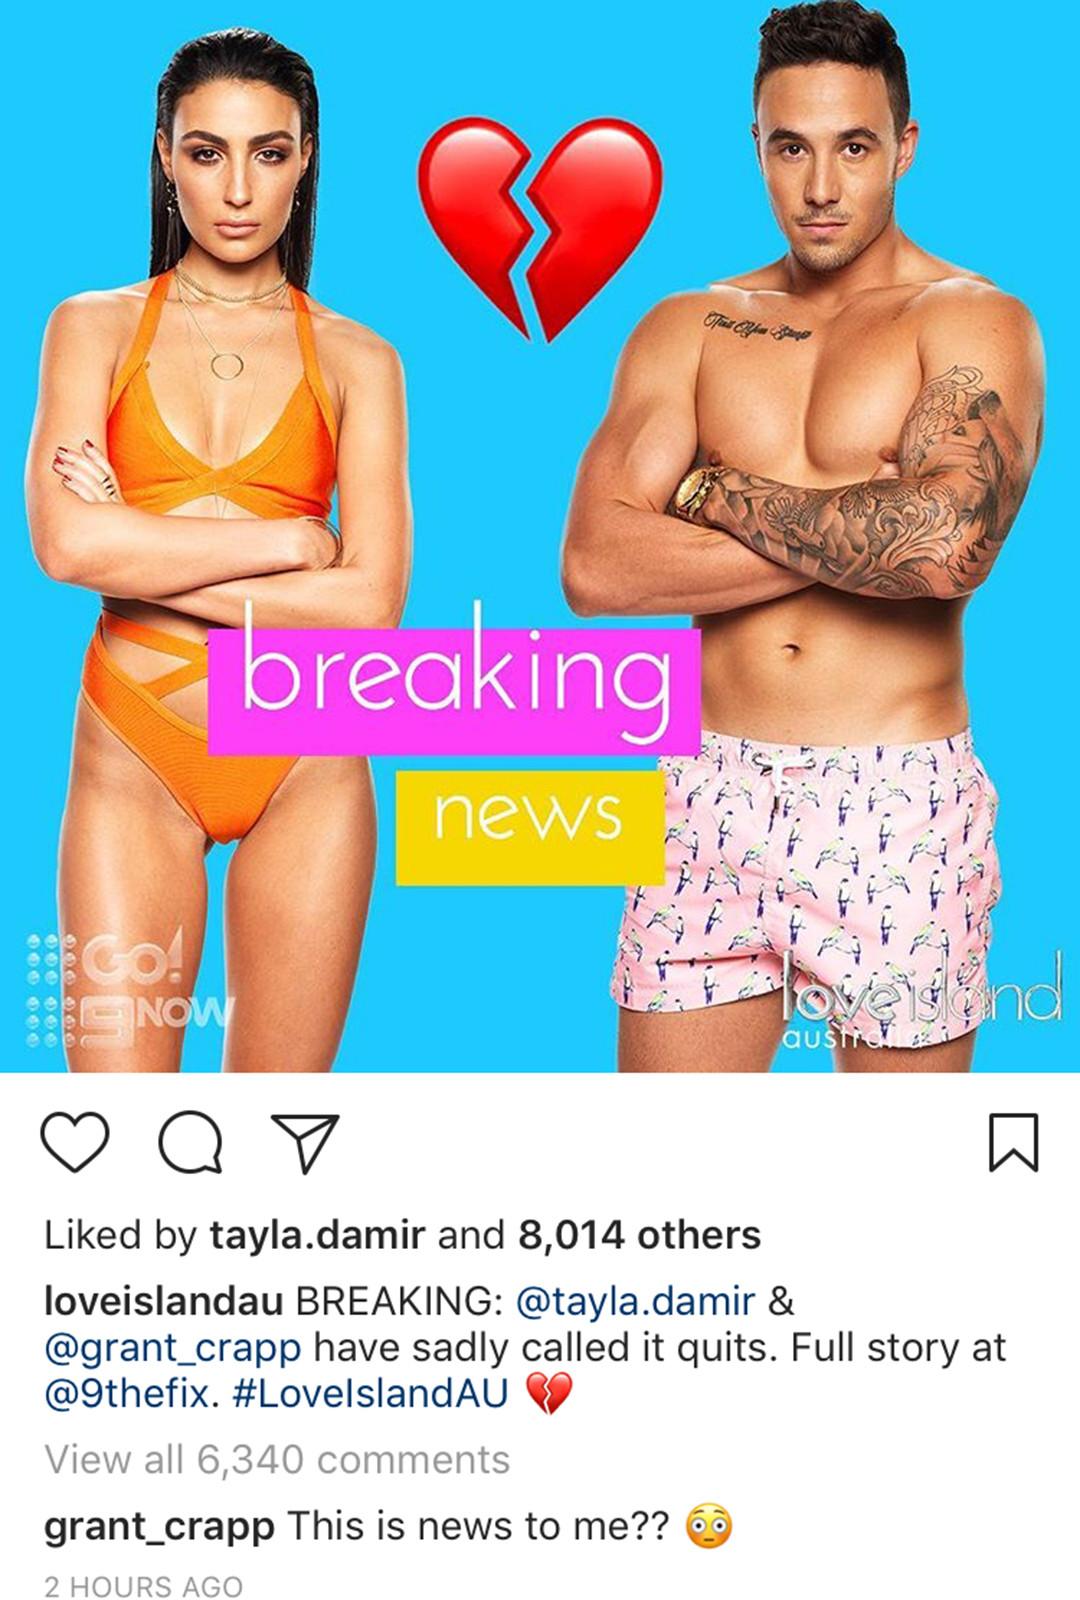 Tayla Damir, Grant Crapp, Love Island